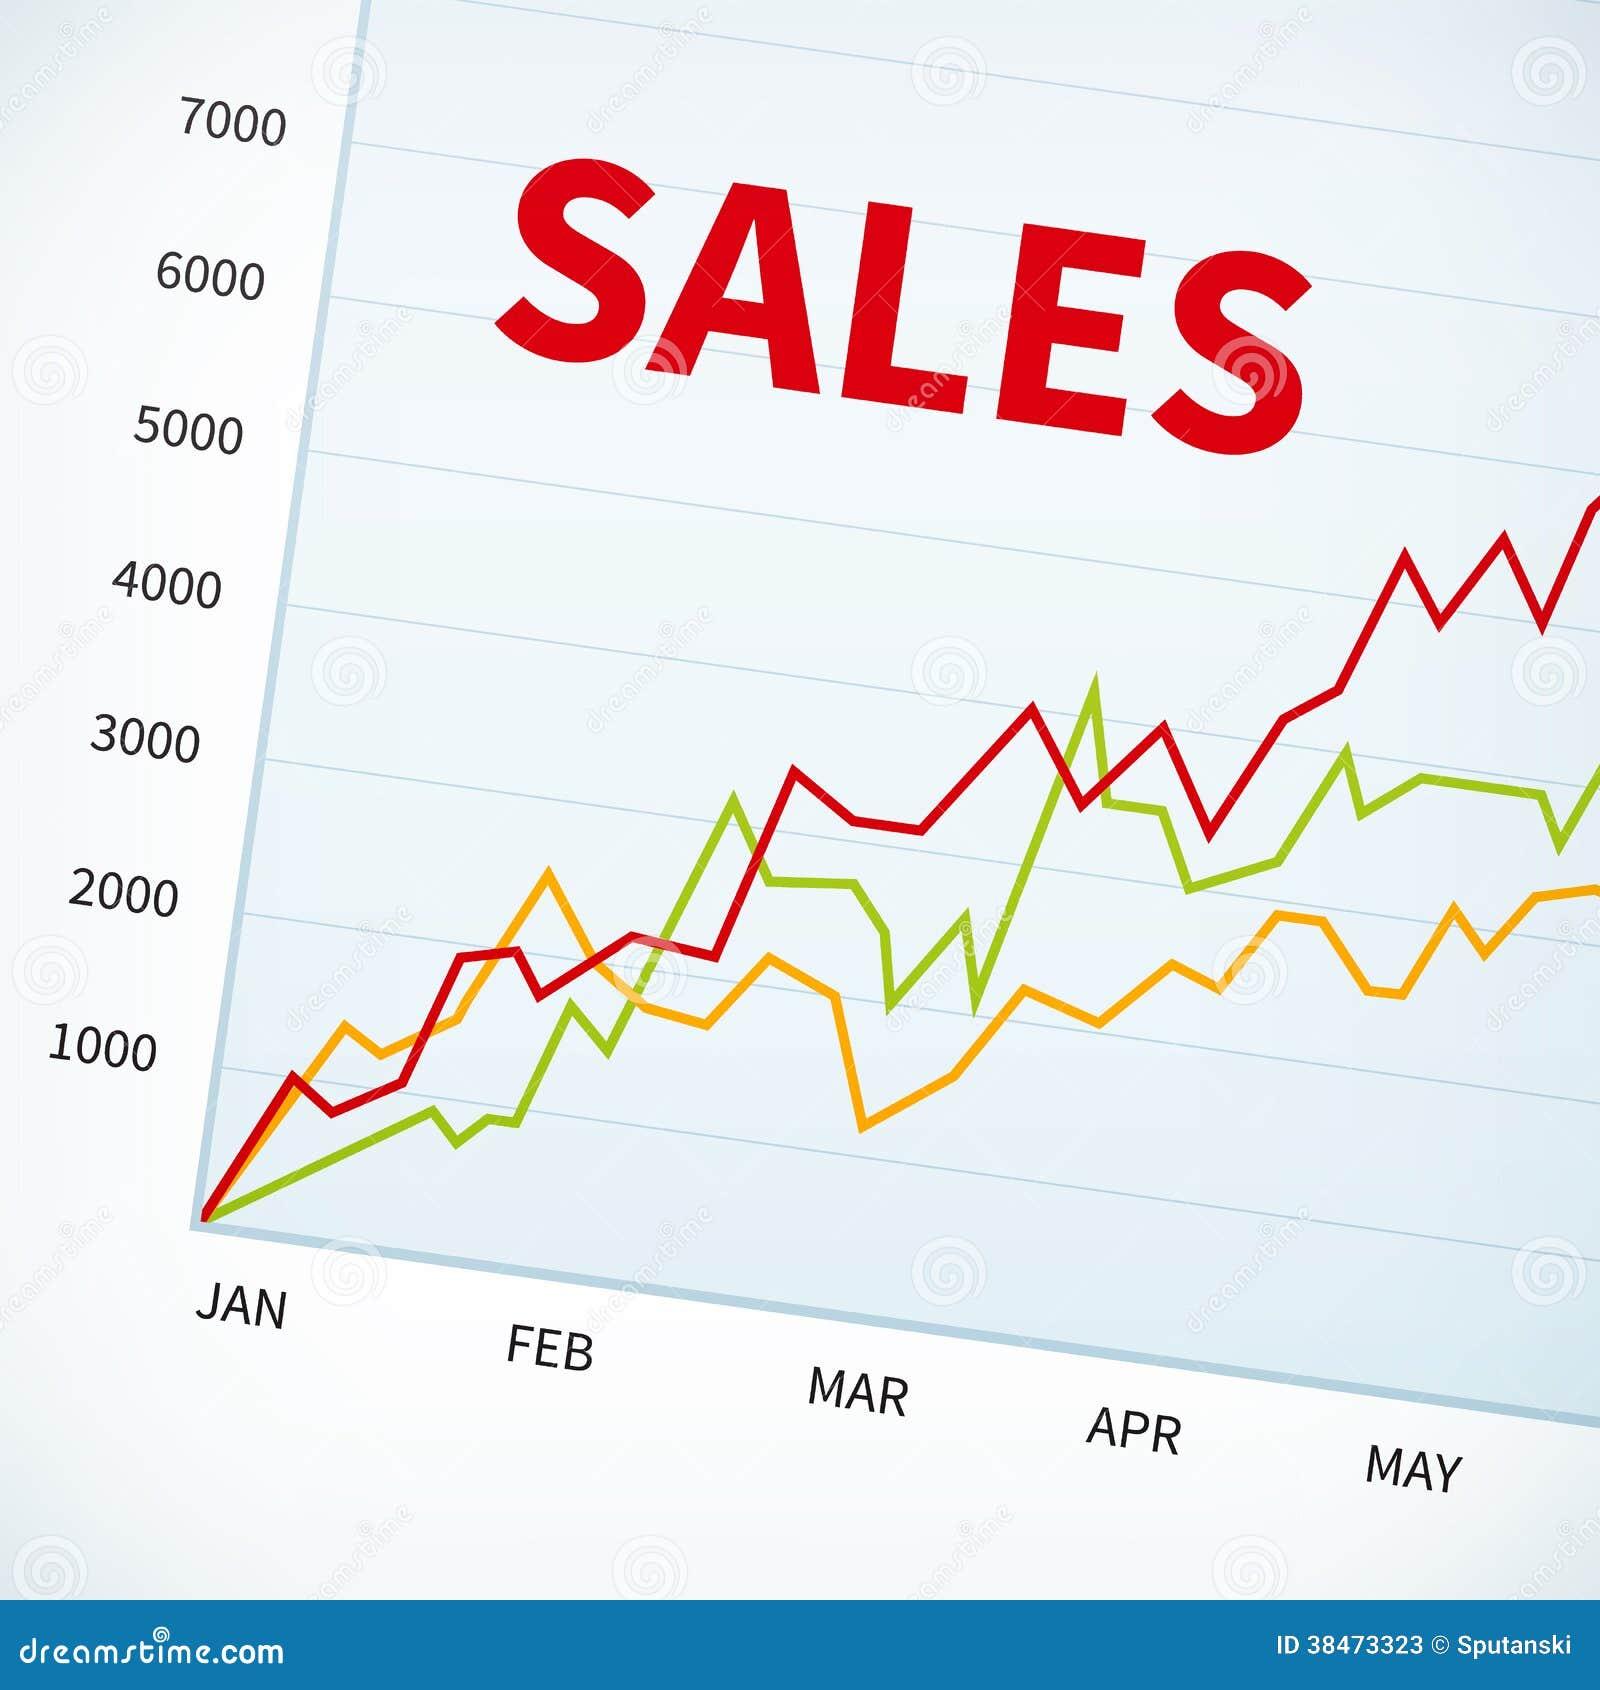 Positive Business Sales Graph Stock Photos - Image: 38473323